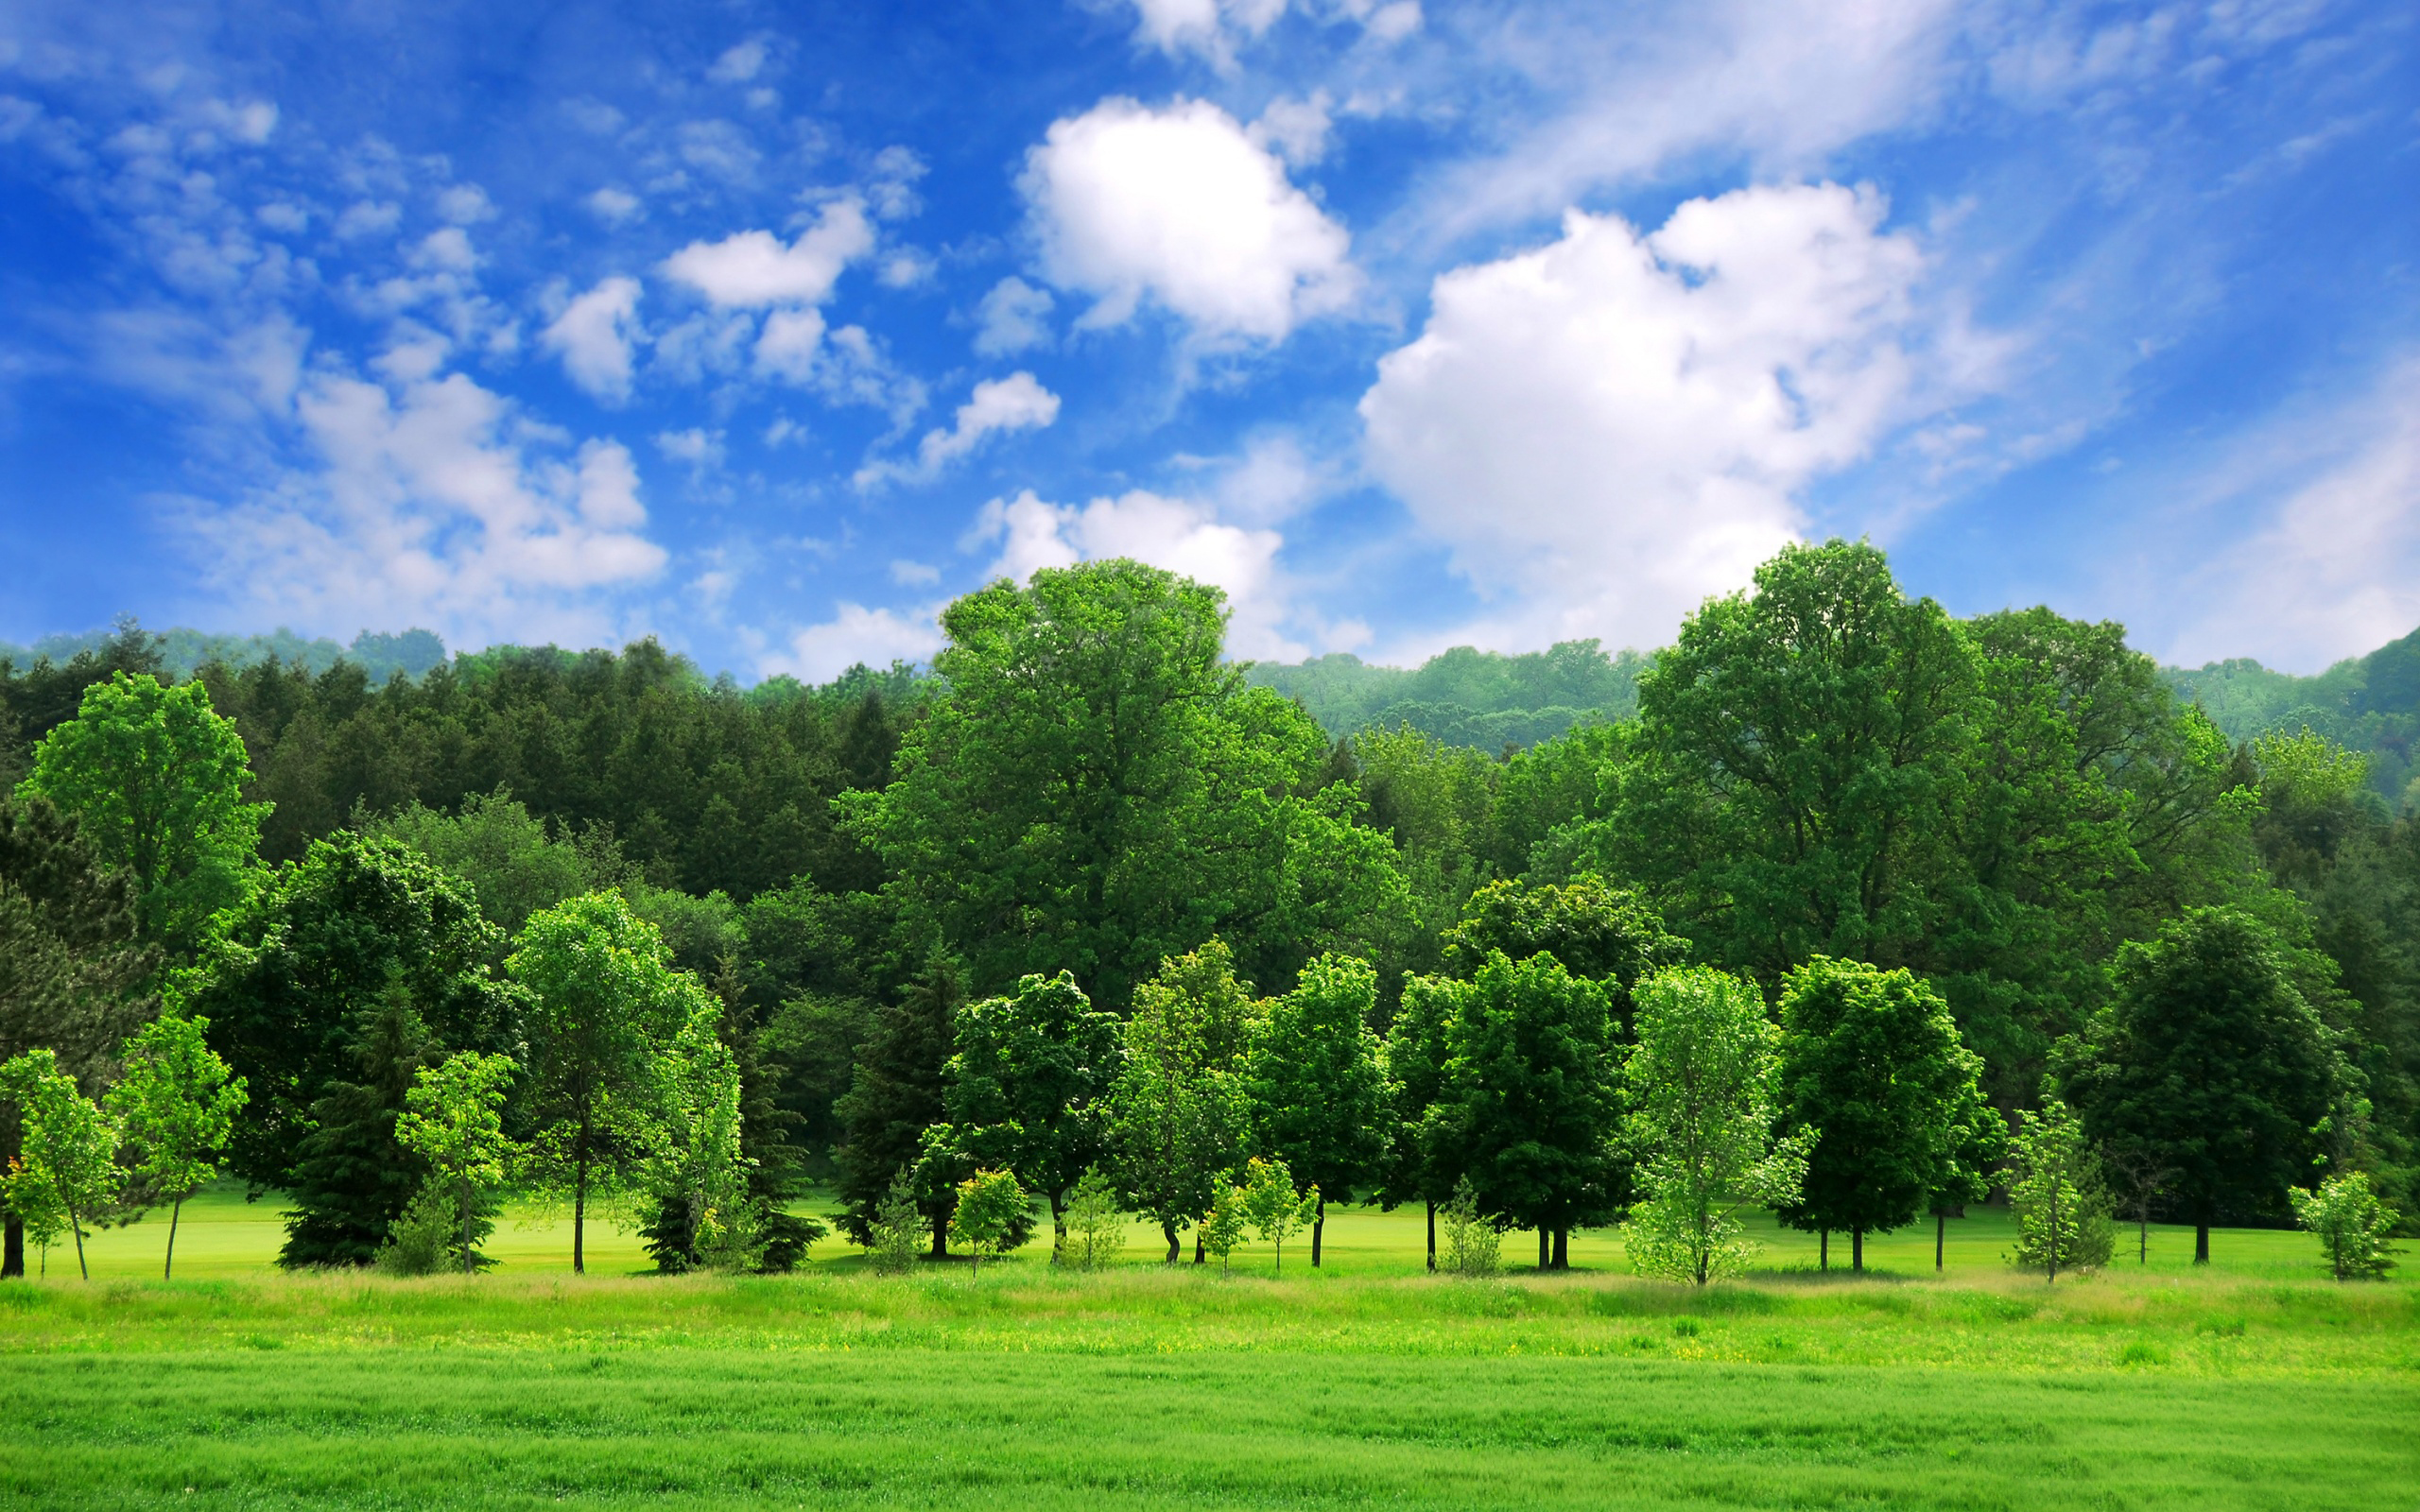 Natural Landscape Photography Wallpaper 8573 High